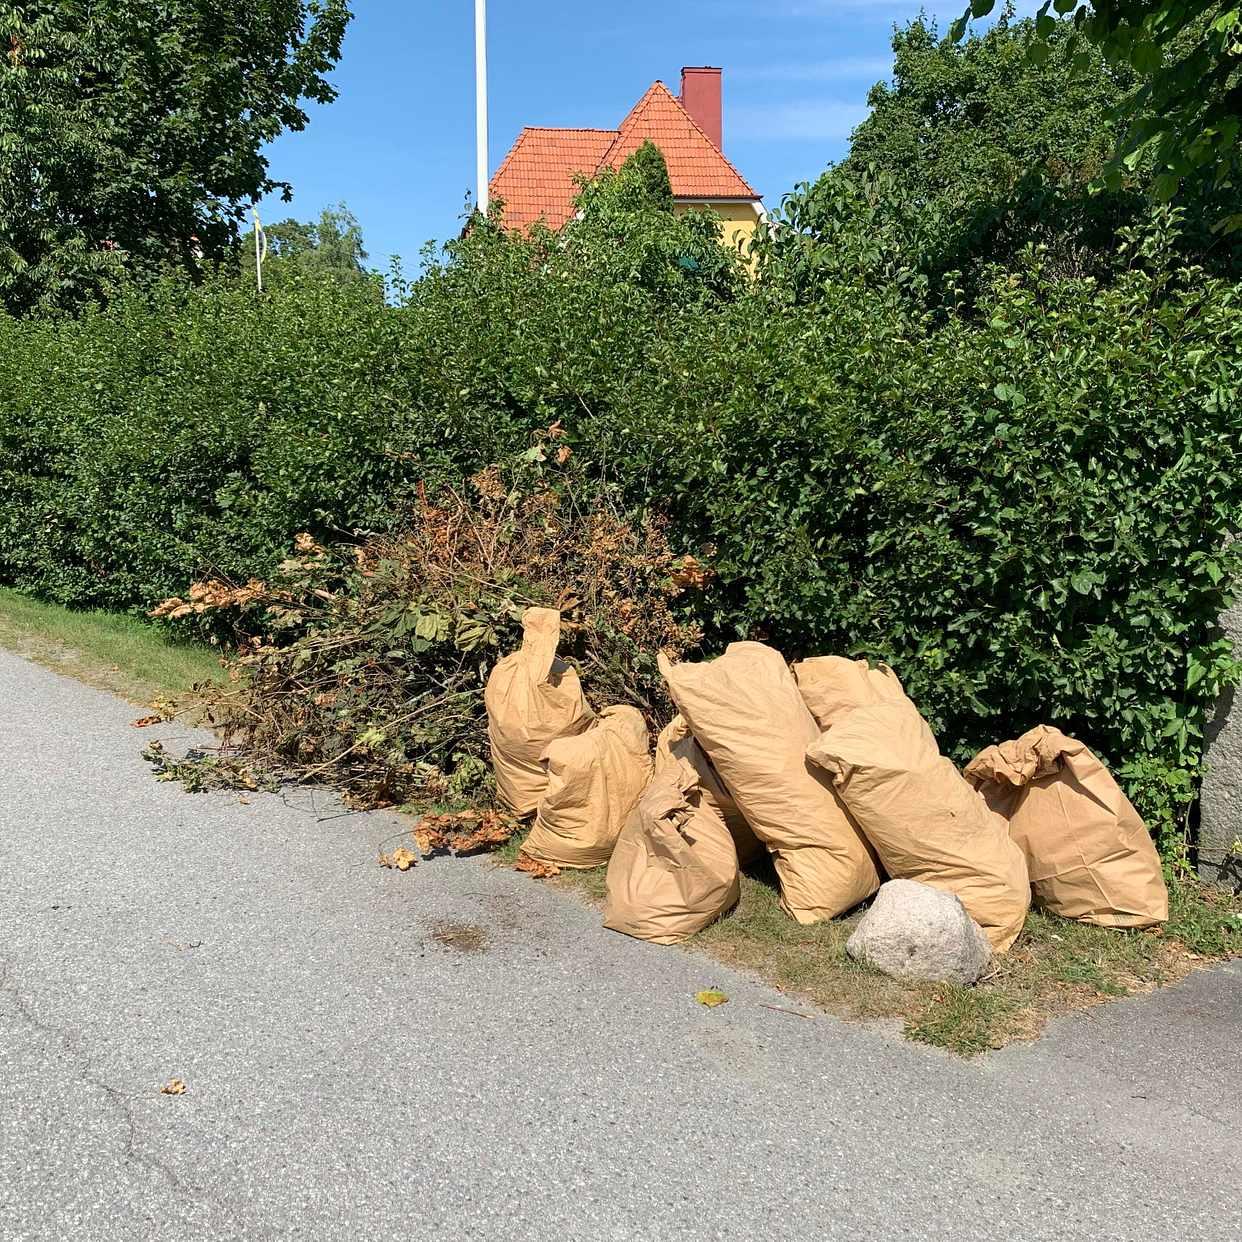 image of Trädgårdsavfall - Lidingö